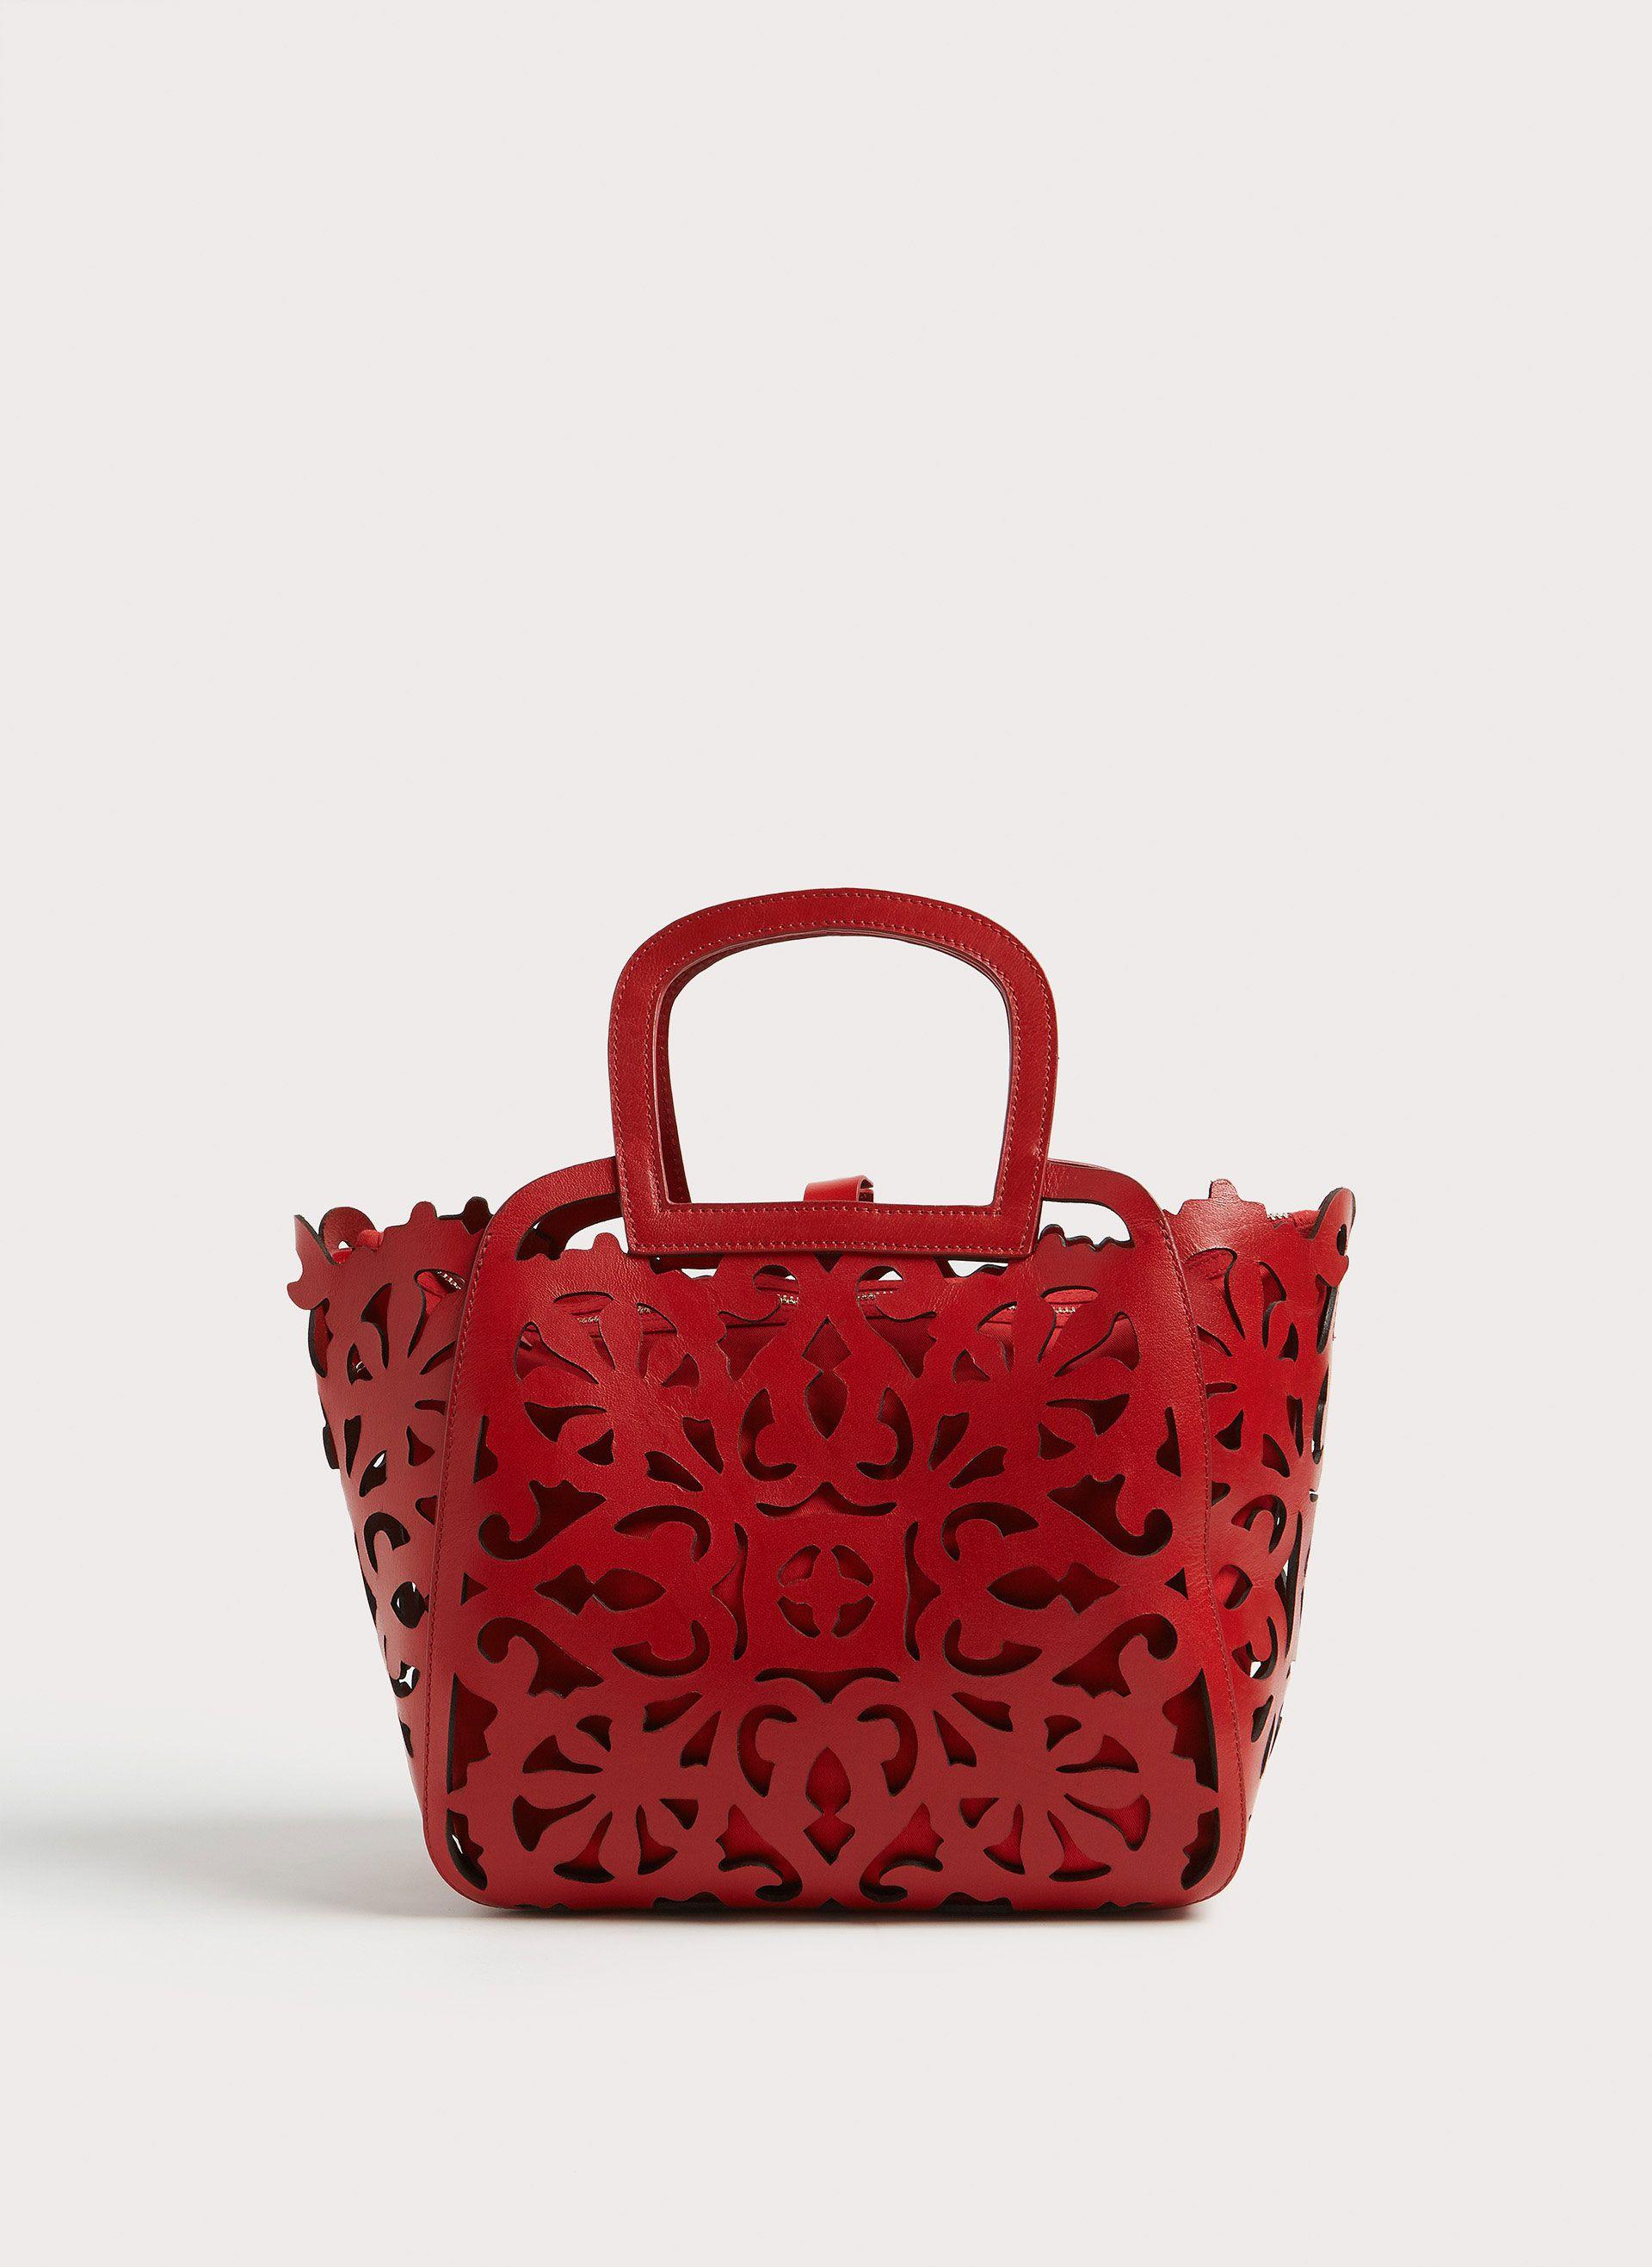 Bolso RojoBolsos TroqueladoShoesamp; Bags Y Piel Zapatos Shopper tQdrxhCs